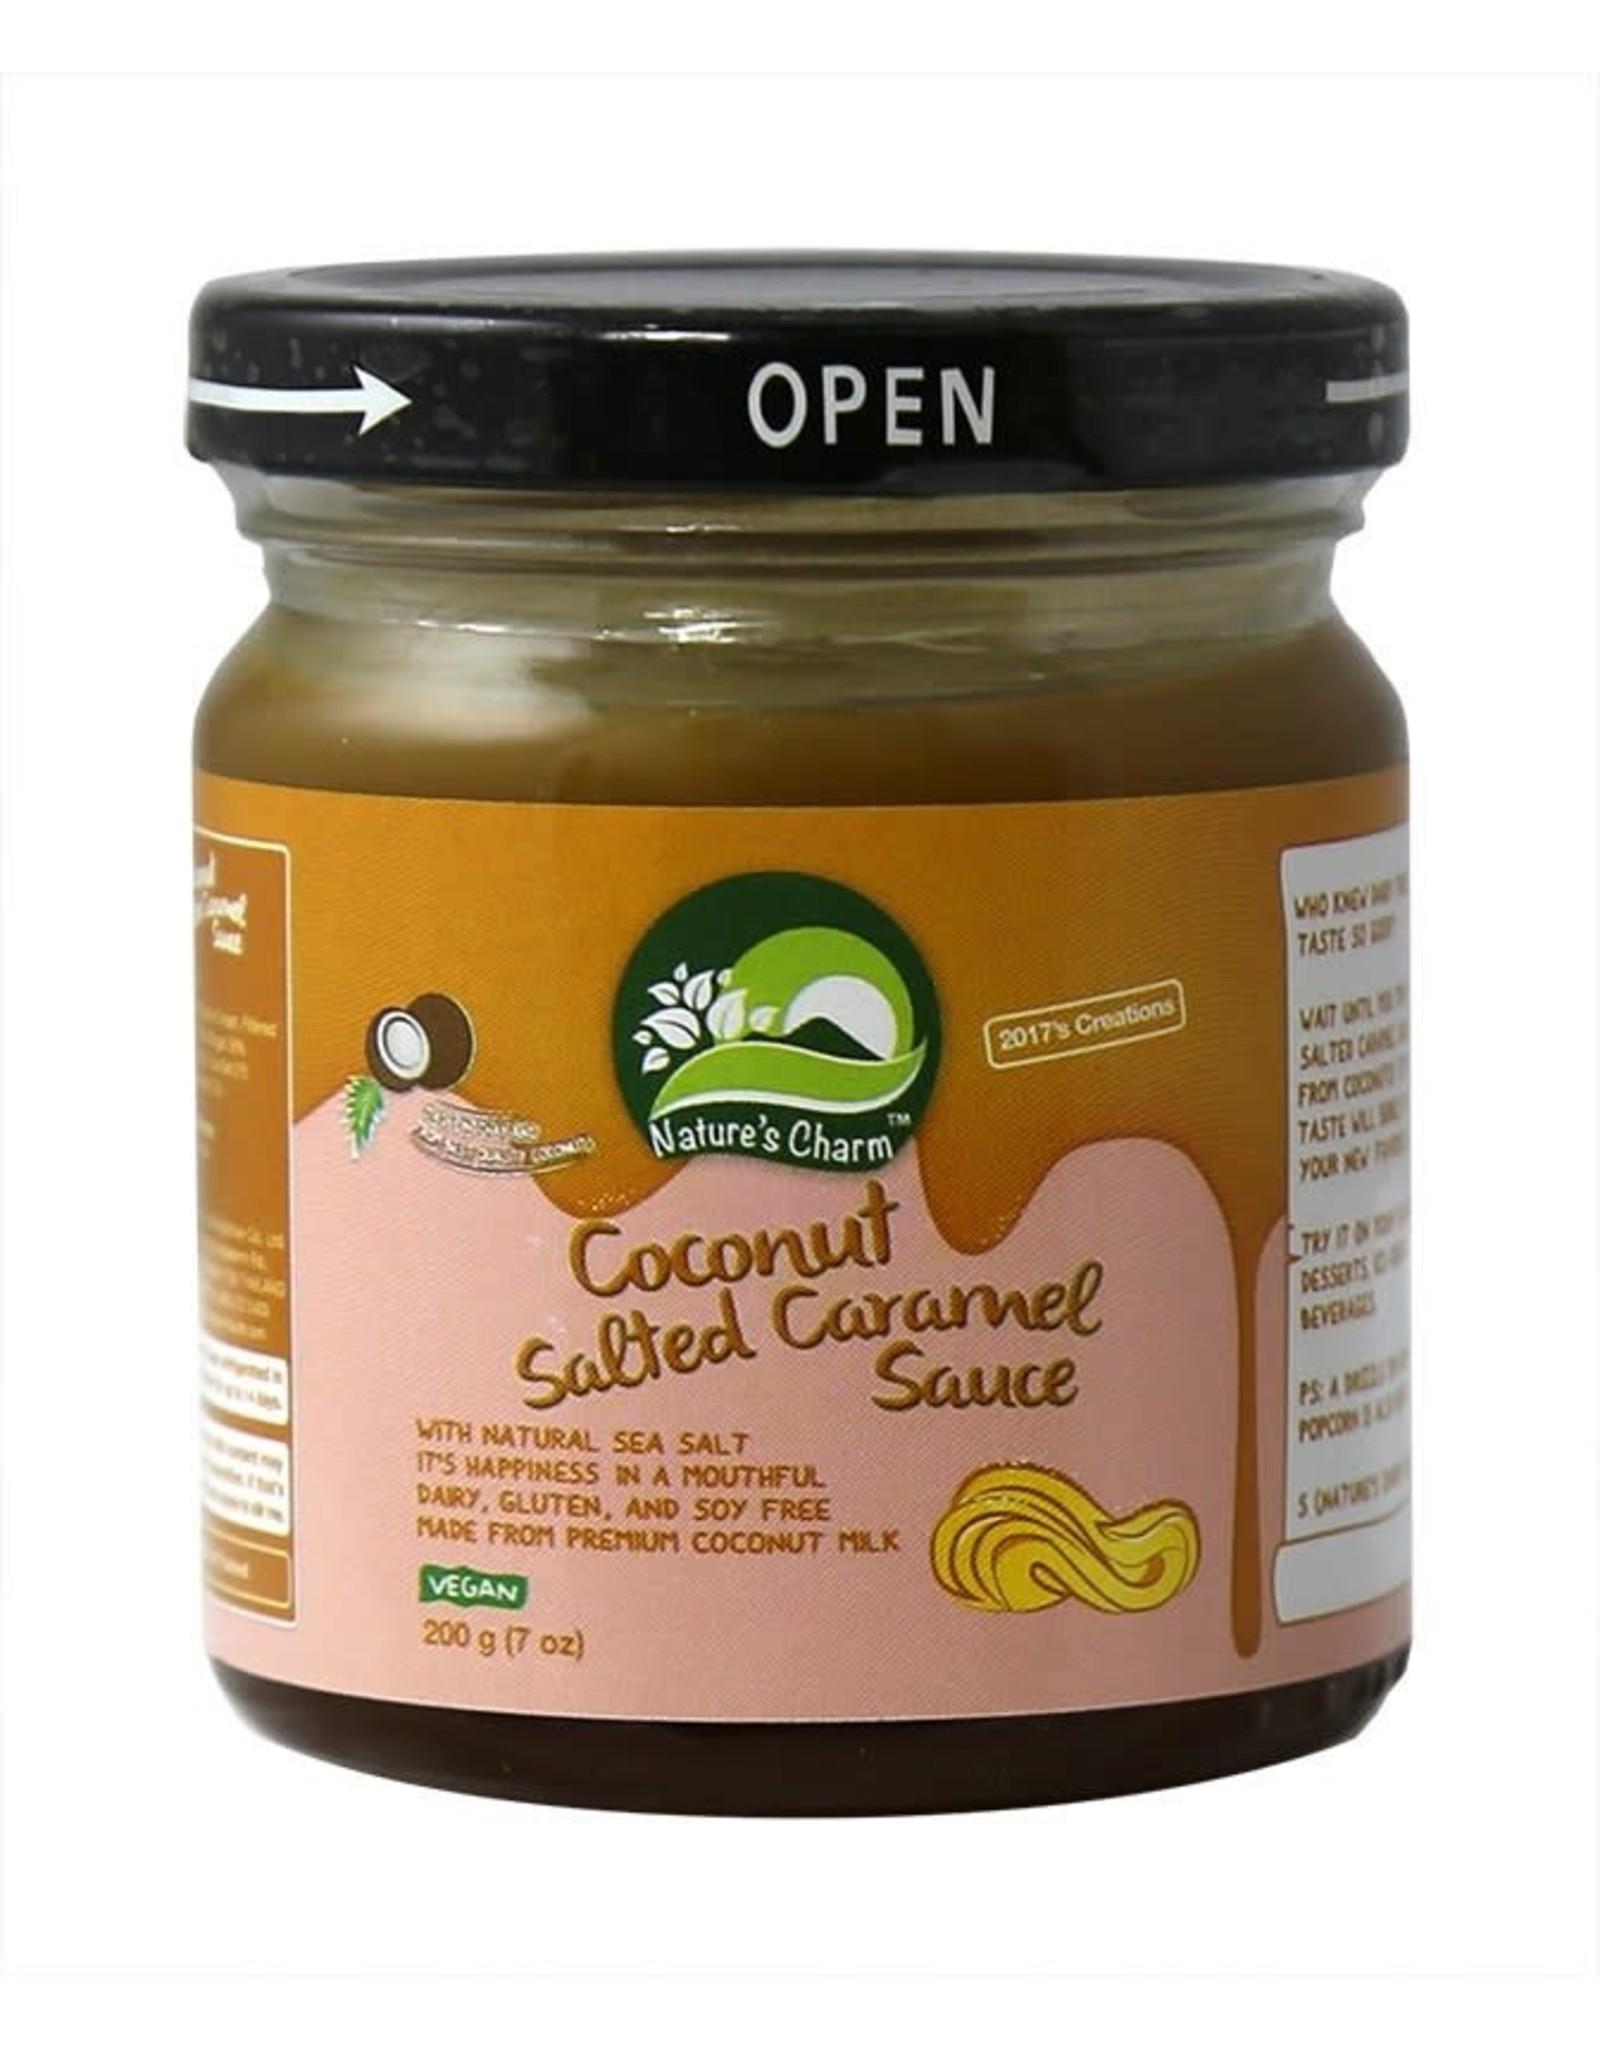 Nature's Charm Coconut Salted Chocolade Fudge Sauce